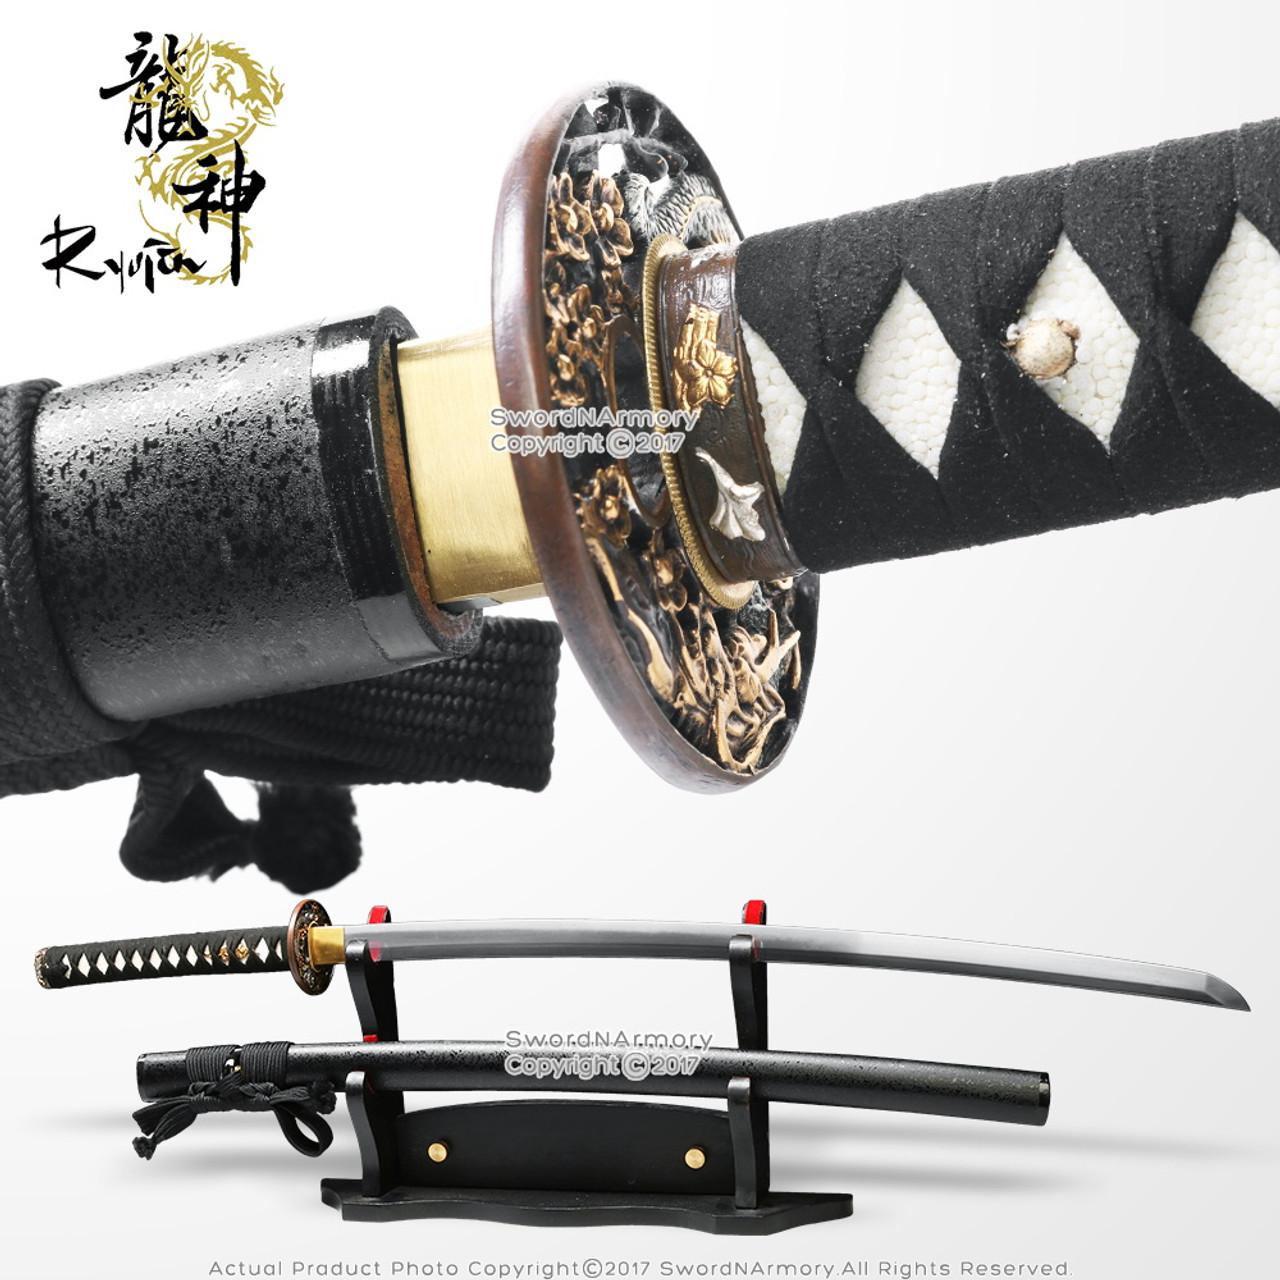 ryujin 40 handmade samurai katana sword 5160 spring steel blade sharp